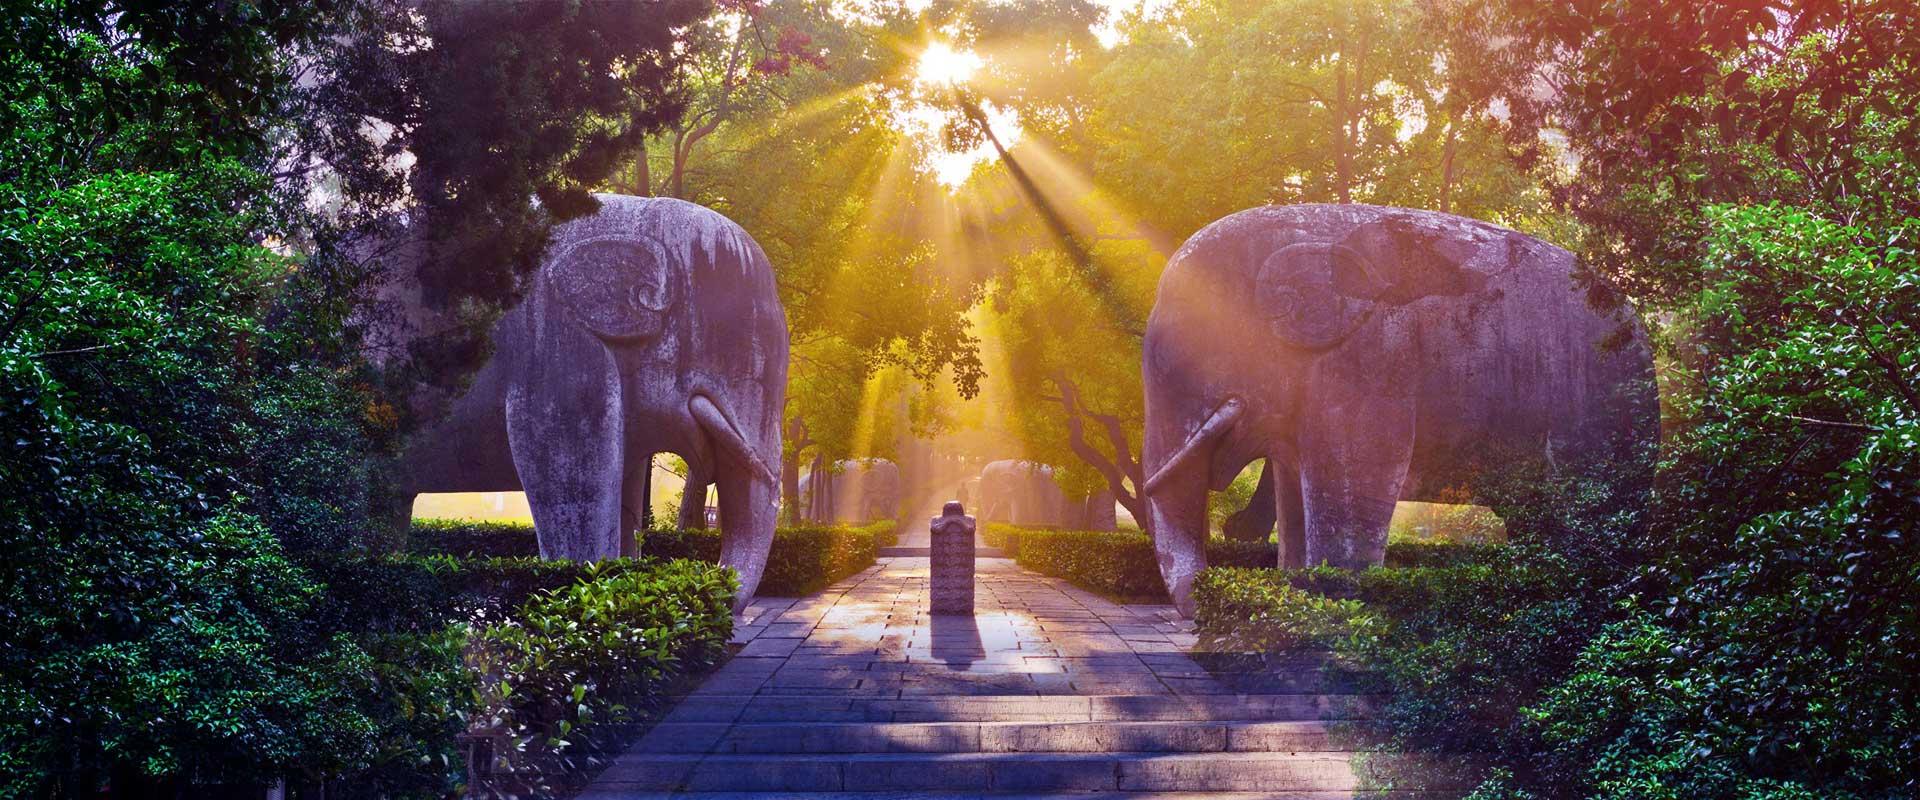 https://www.gonanjingchina.com/sites/default/files/nanjing-travel-ming-tomb.jpg